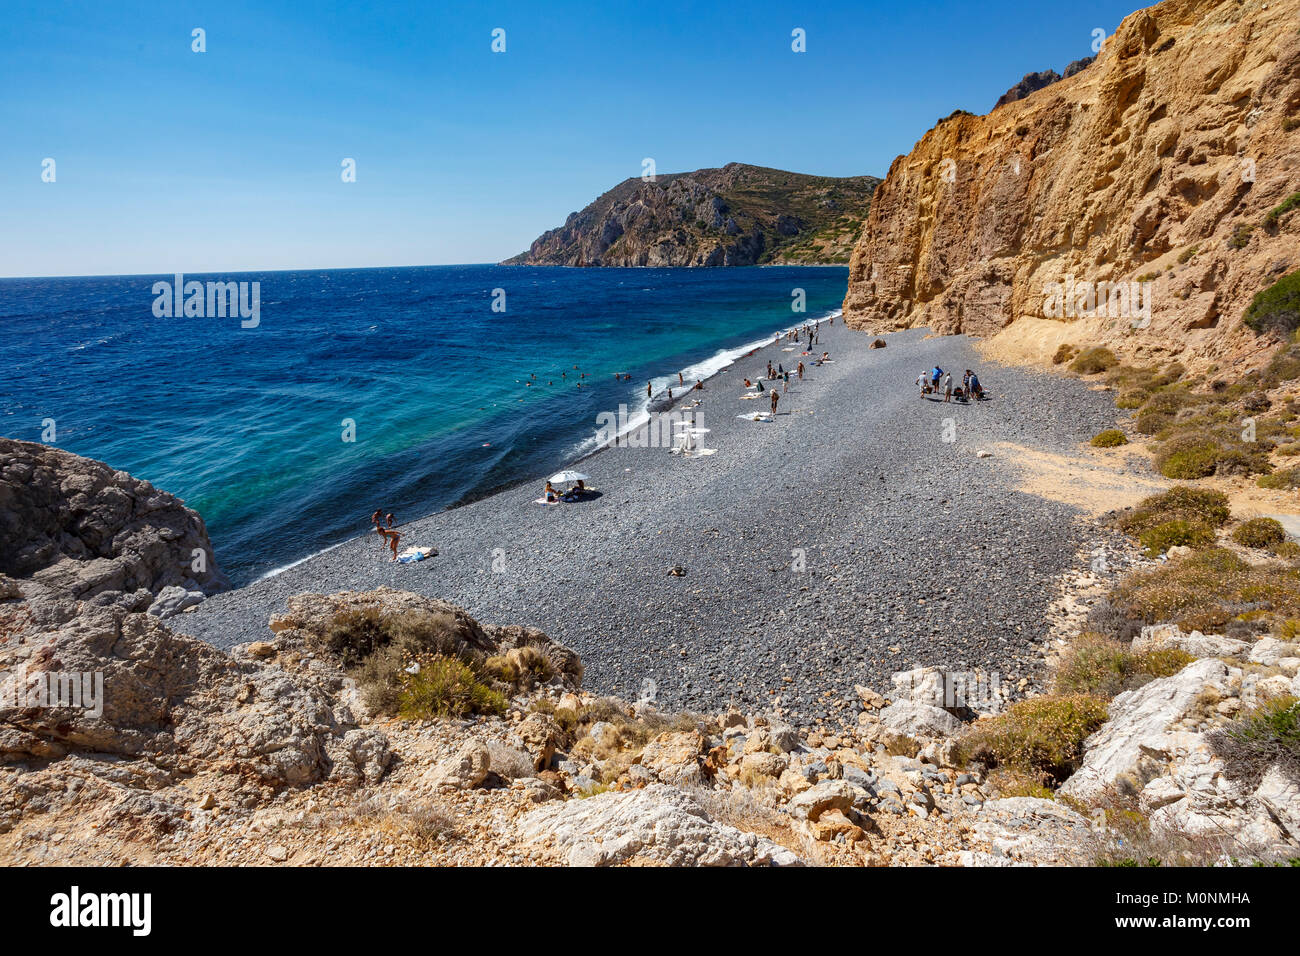 Mavra Volia Beach, Emporios, Chios Island, Greece - Stock Image